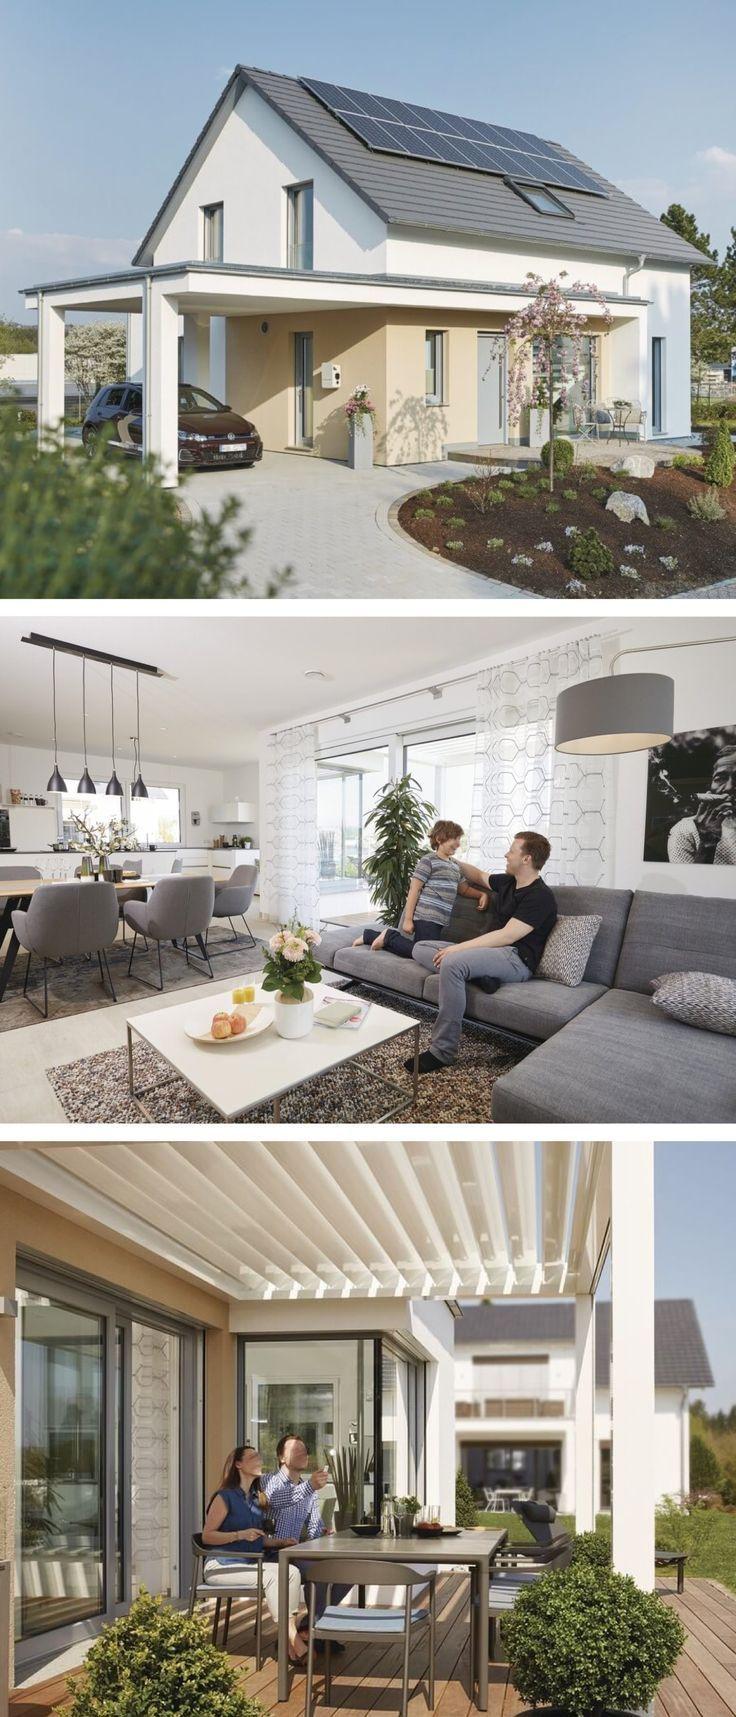 Modernes Satteldach Haus Mit Carport Pergola Anbau